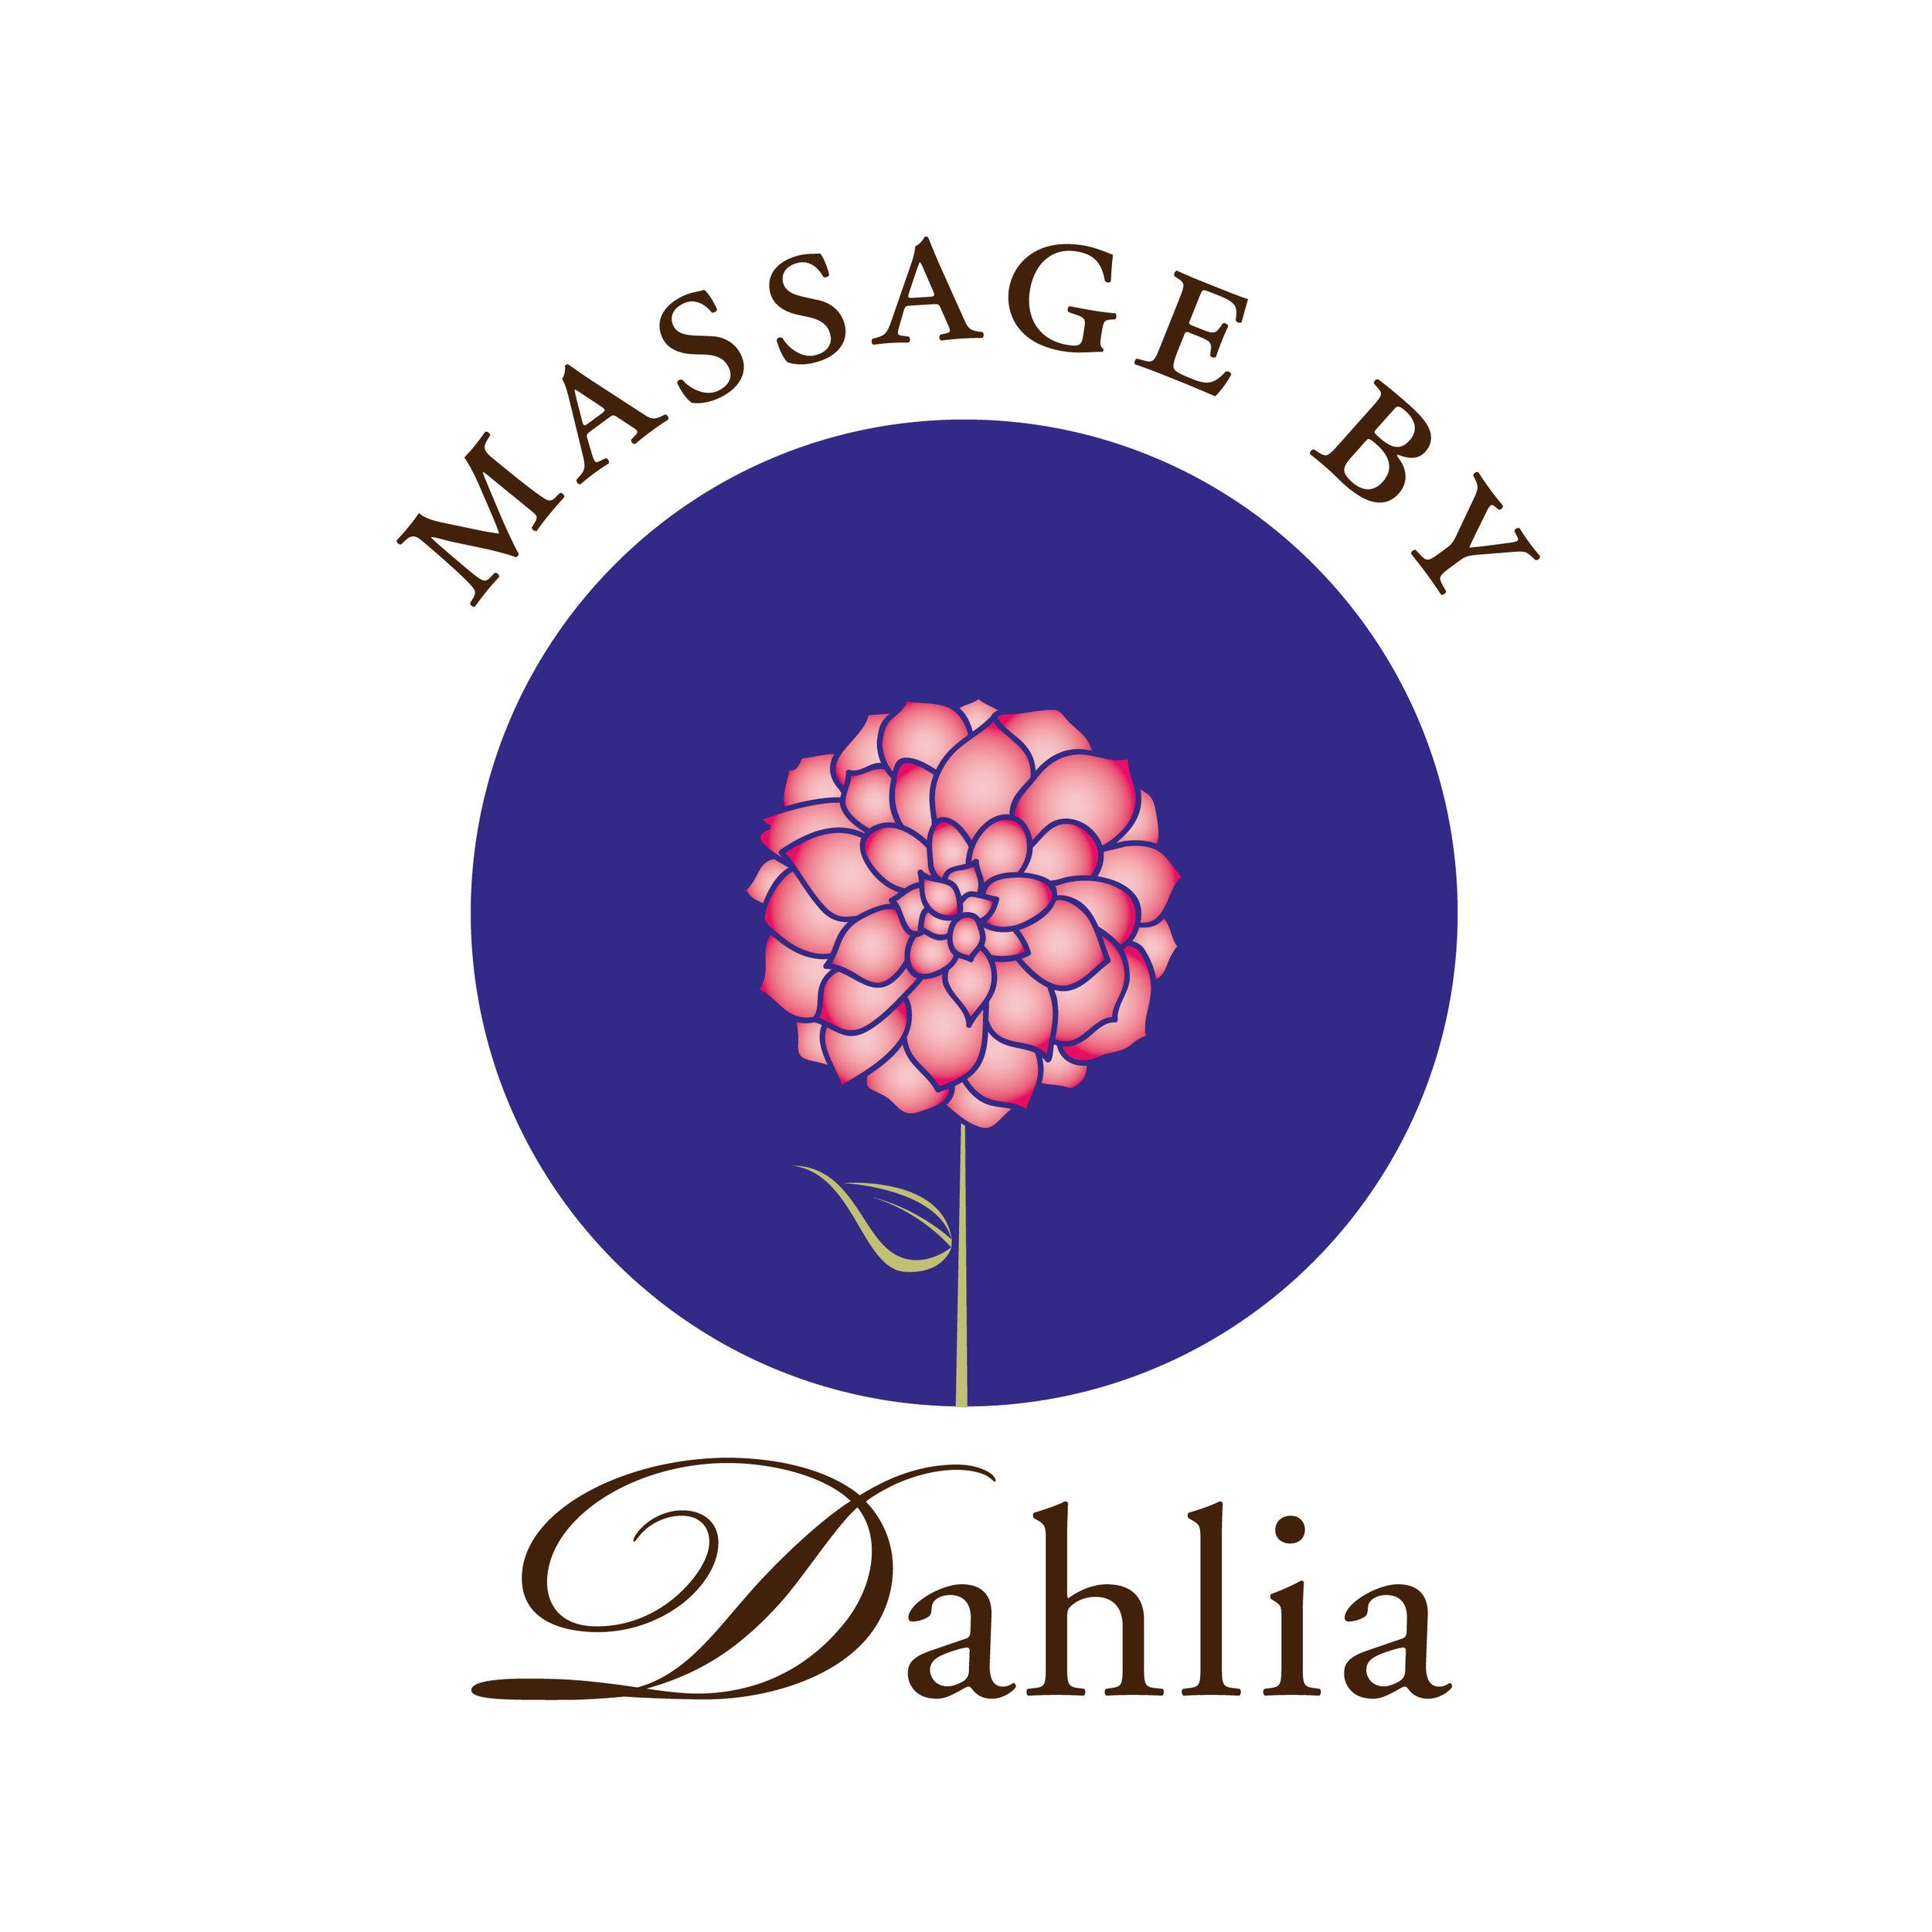 Massage by Dahlia